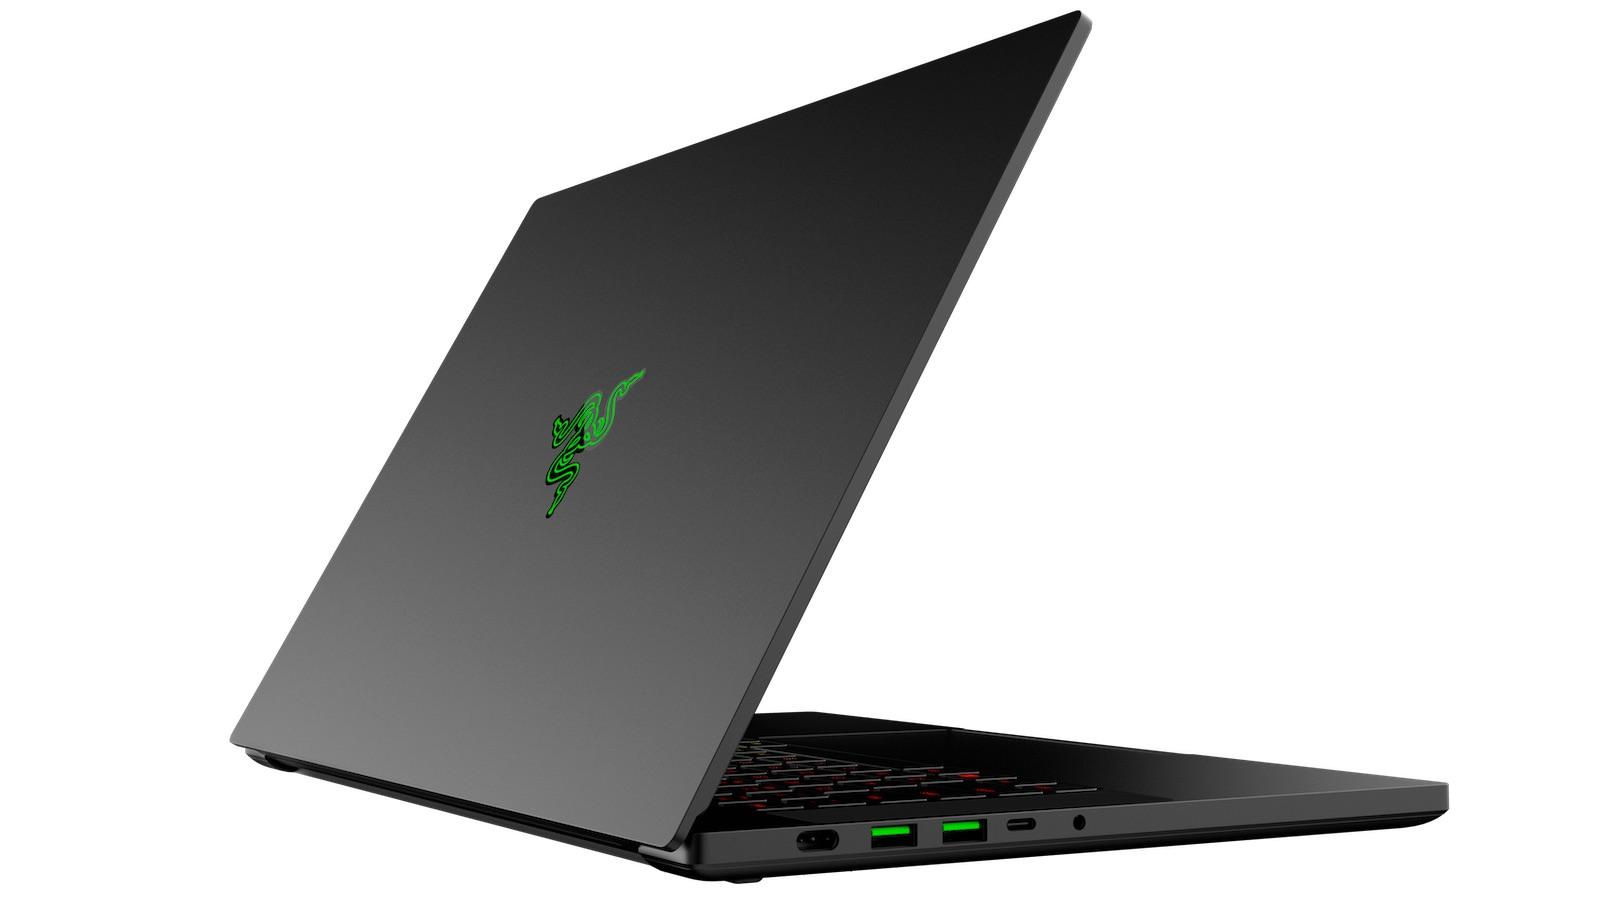 Razer Blade 15 Gaming Laptop (2020 model) Back Angle View